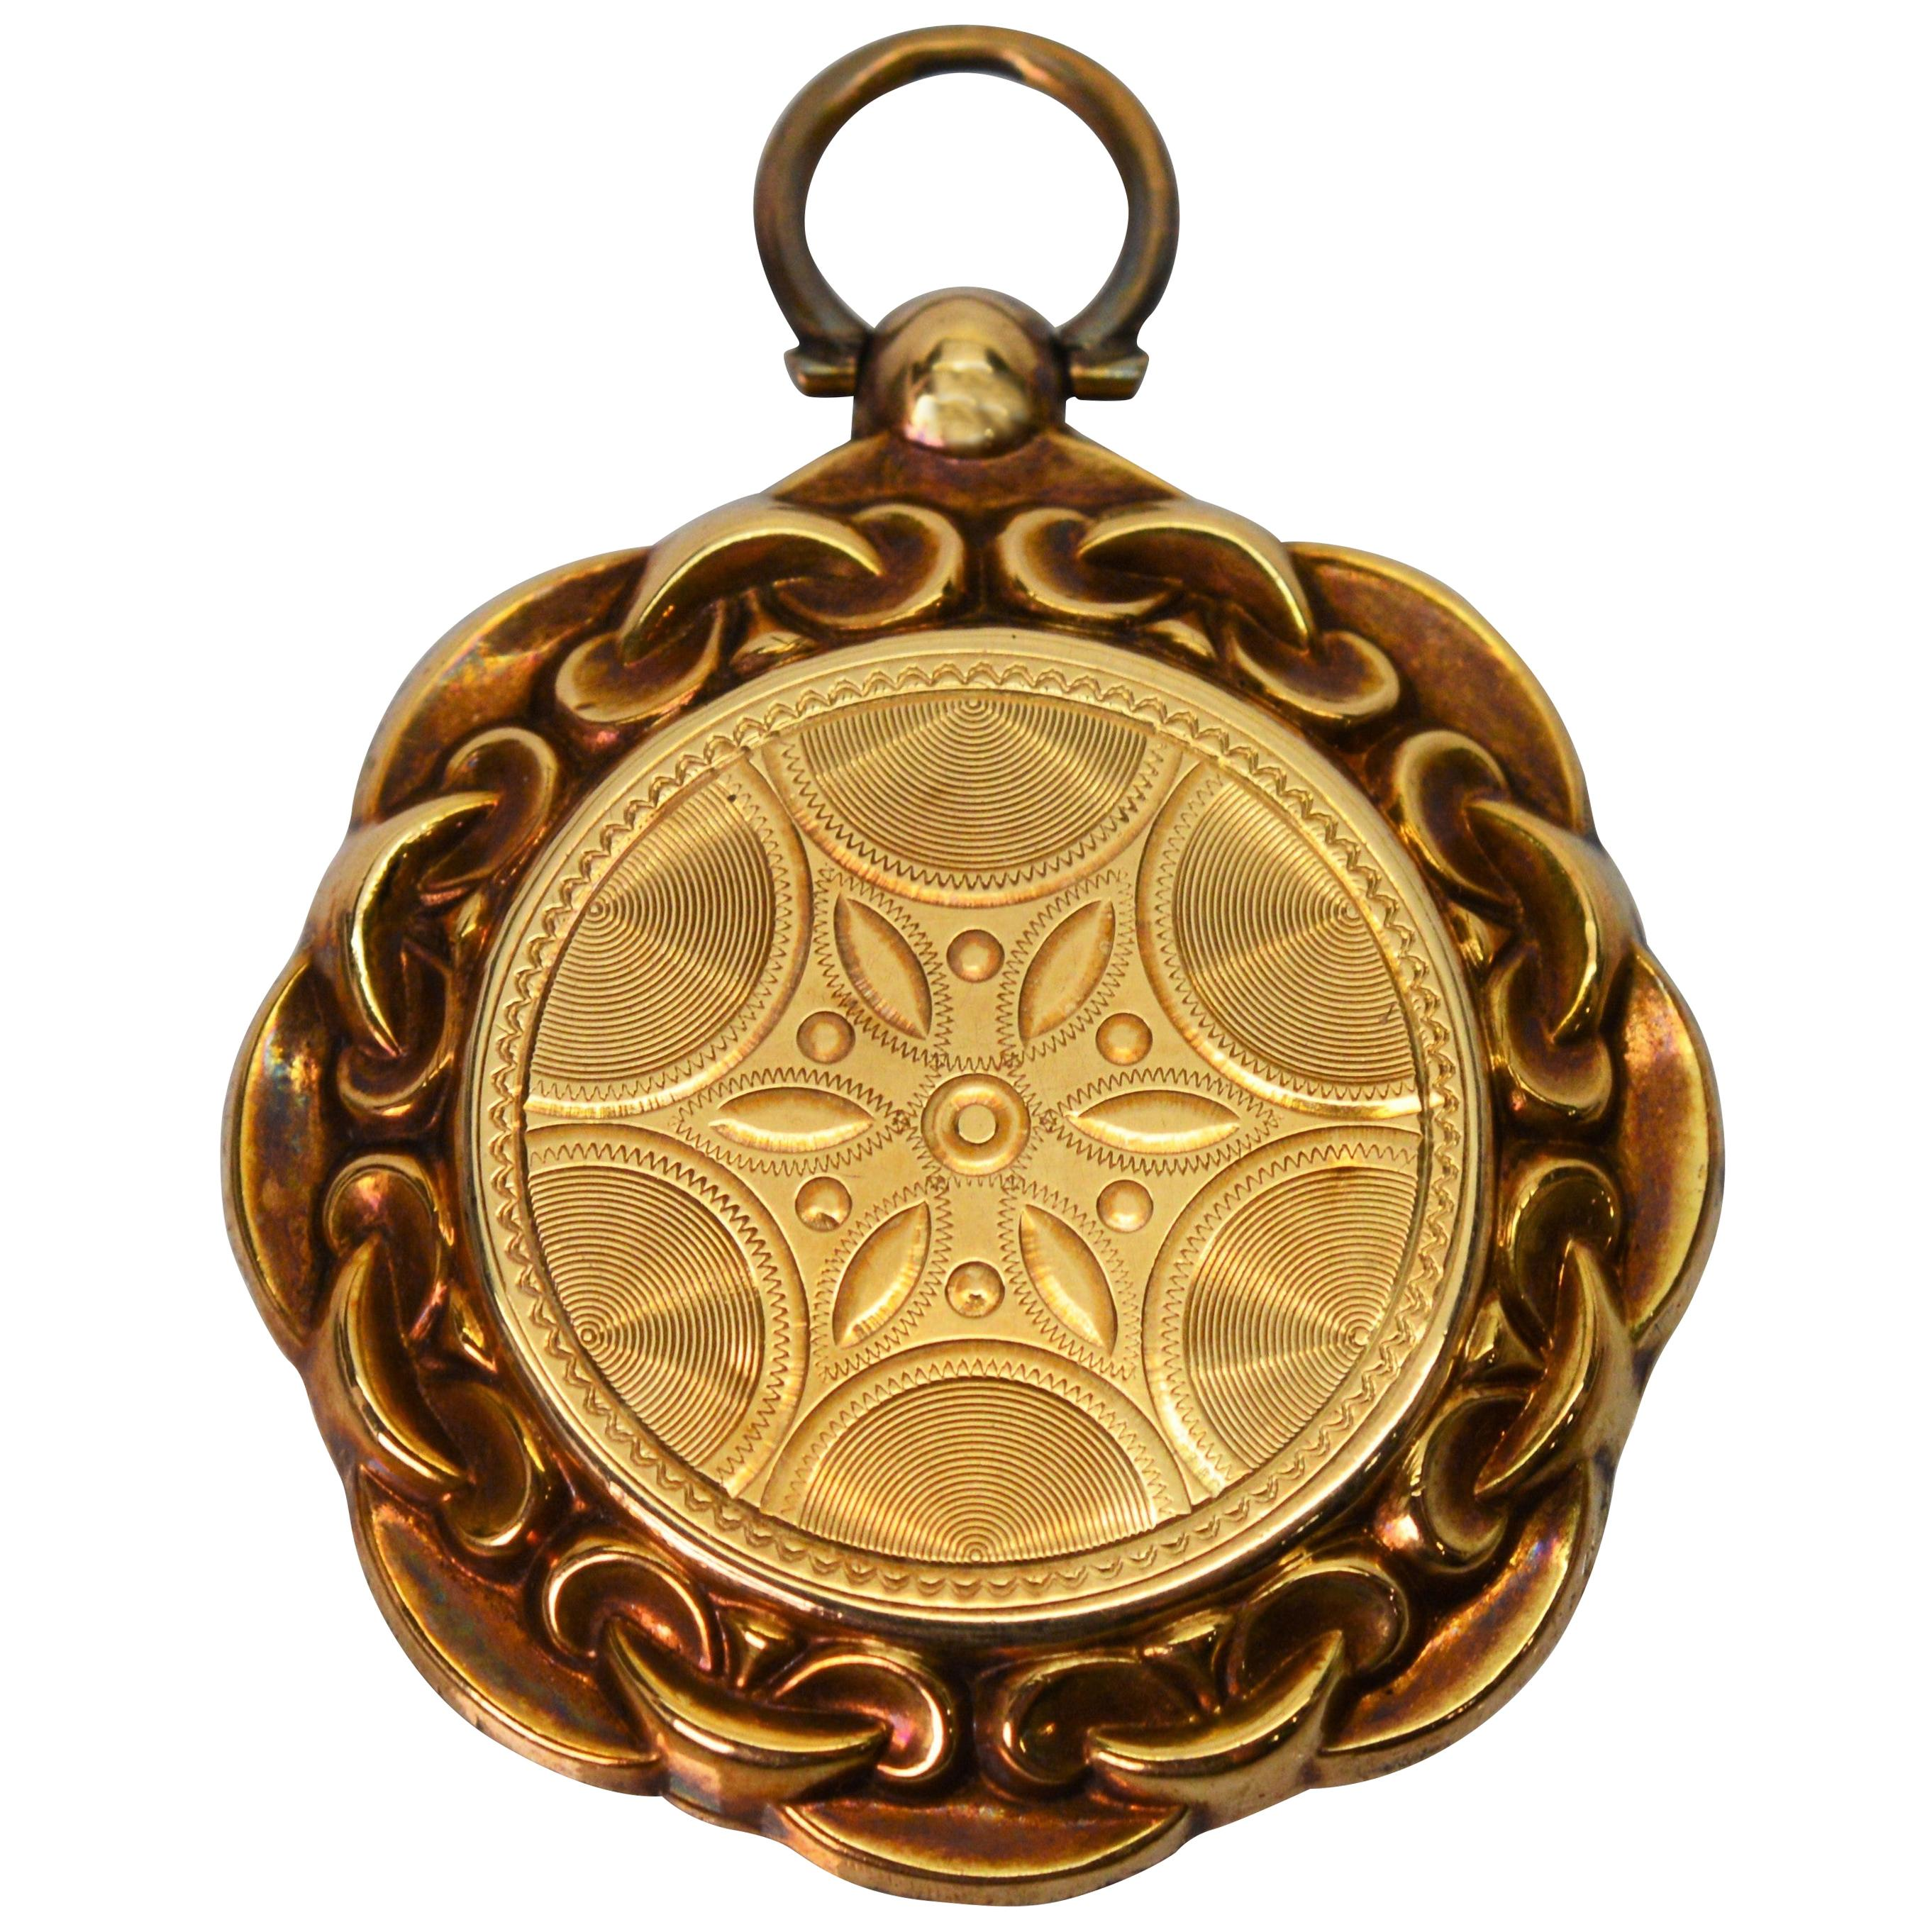 Antique 14 Karat Yellow Gold Locket Charm Pendant